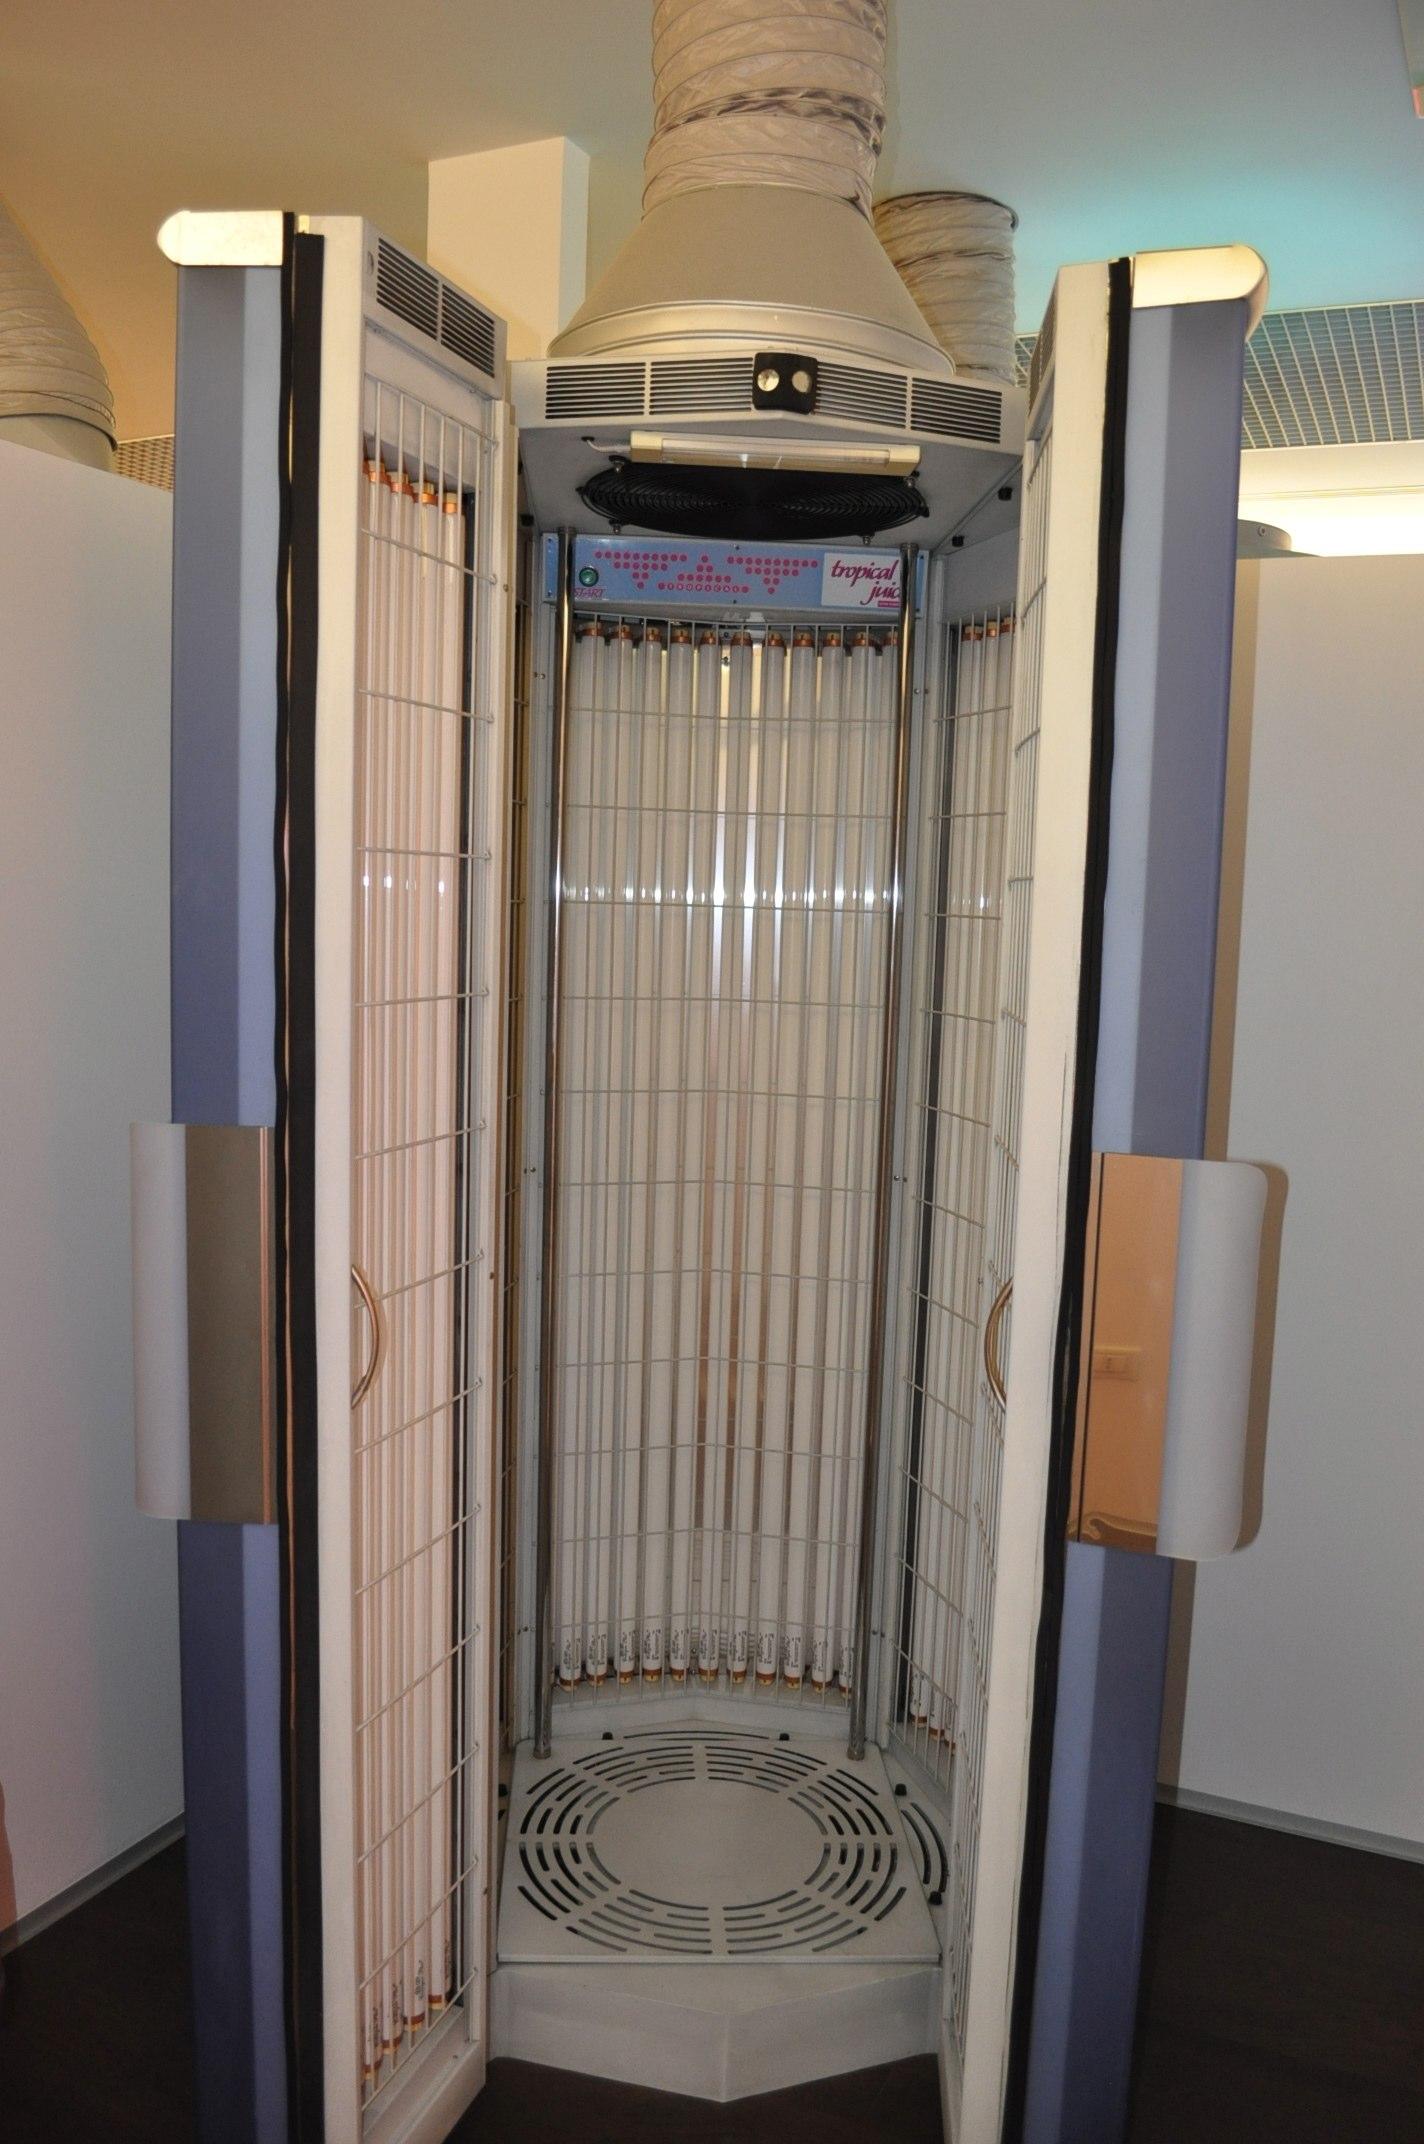 Tenere al caldo in casa 04 02 14 for Obi doccia solare